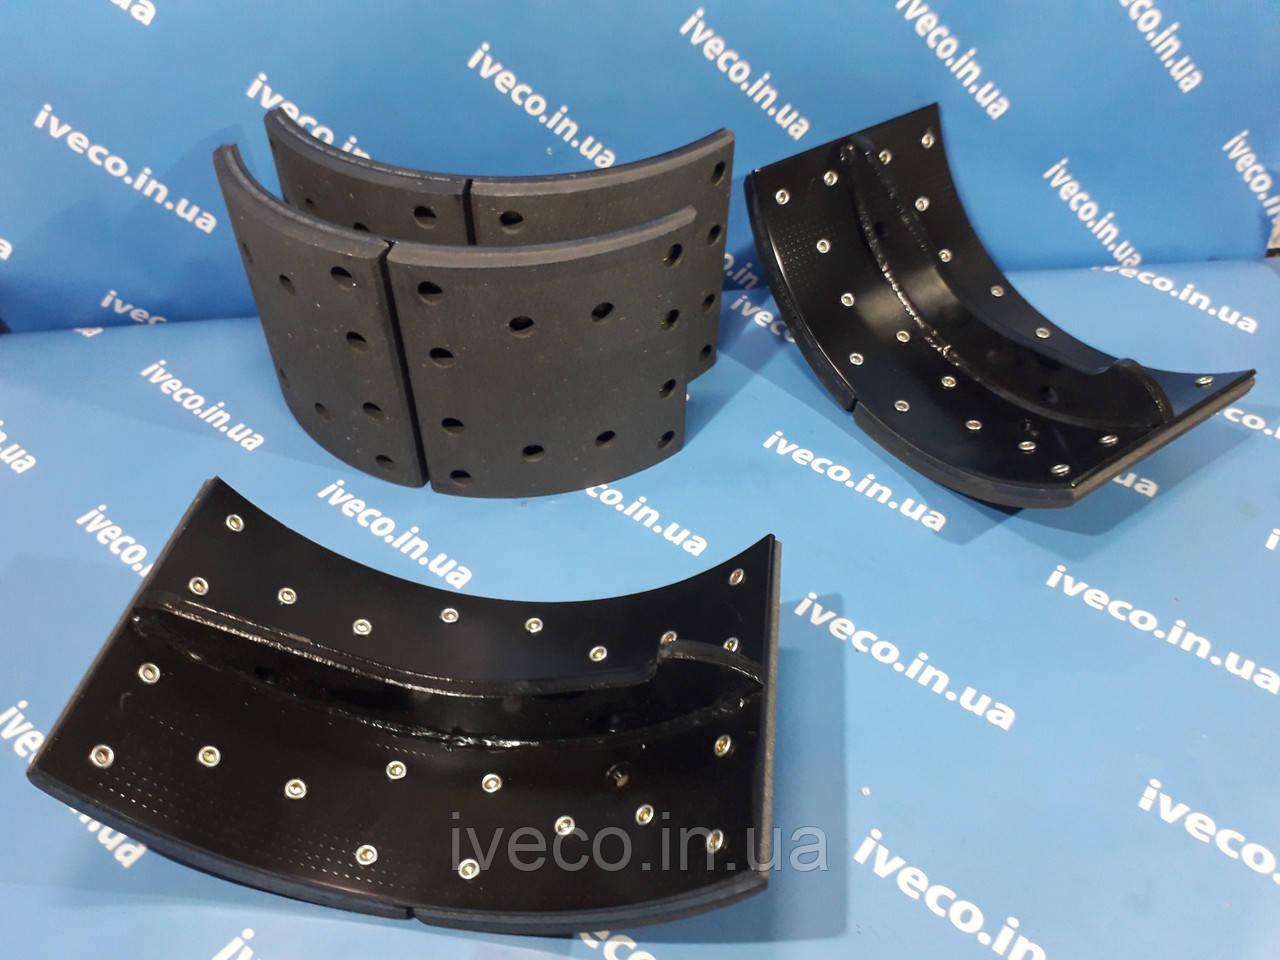 Колодка тормозная Iveco Trakker Eurotrakker Ивеко 42537727 41285024 2992378 2996501 2995824 2992123